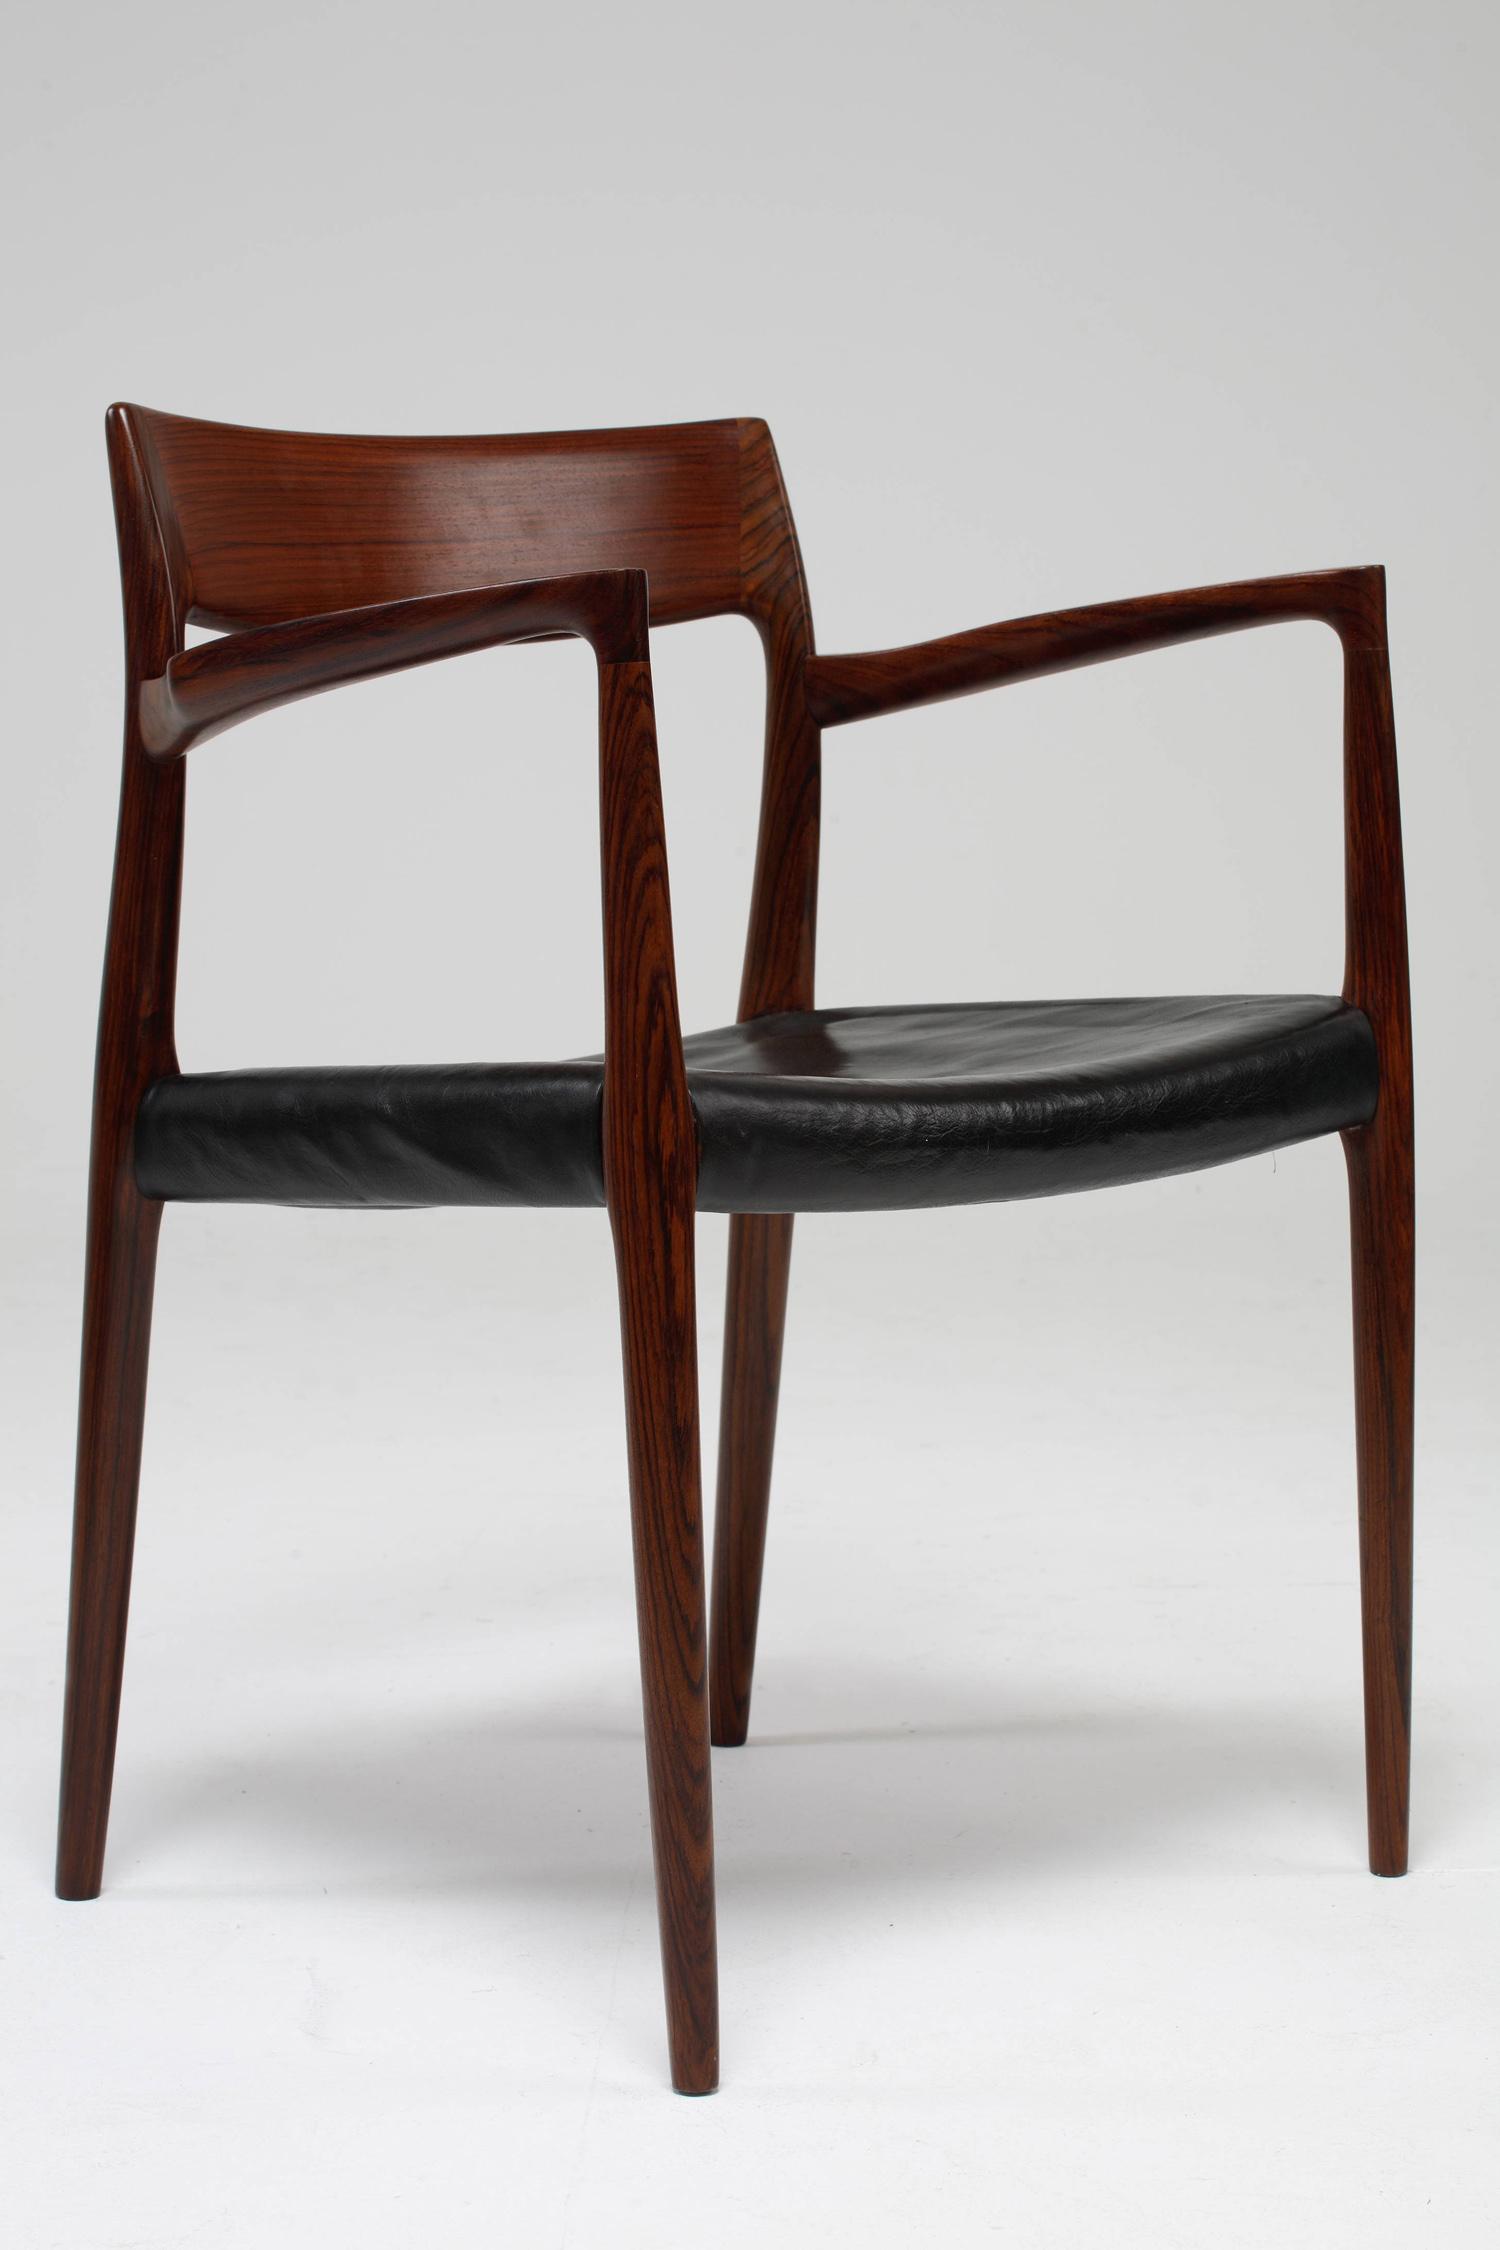 N O Moller 1958 Carver   • made 1958-90  •